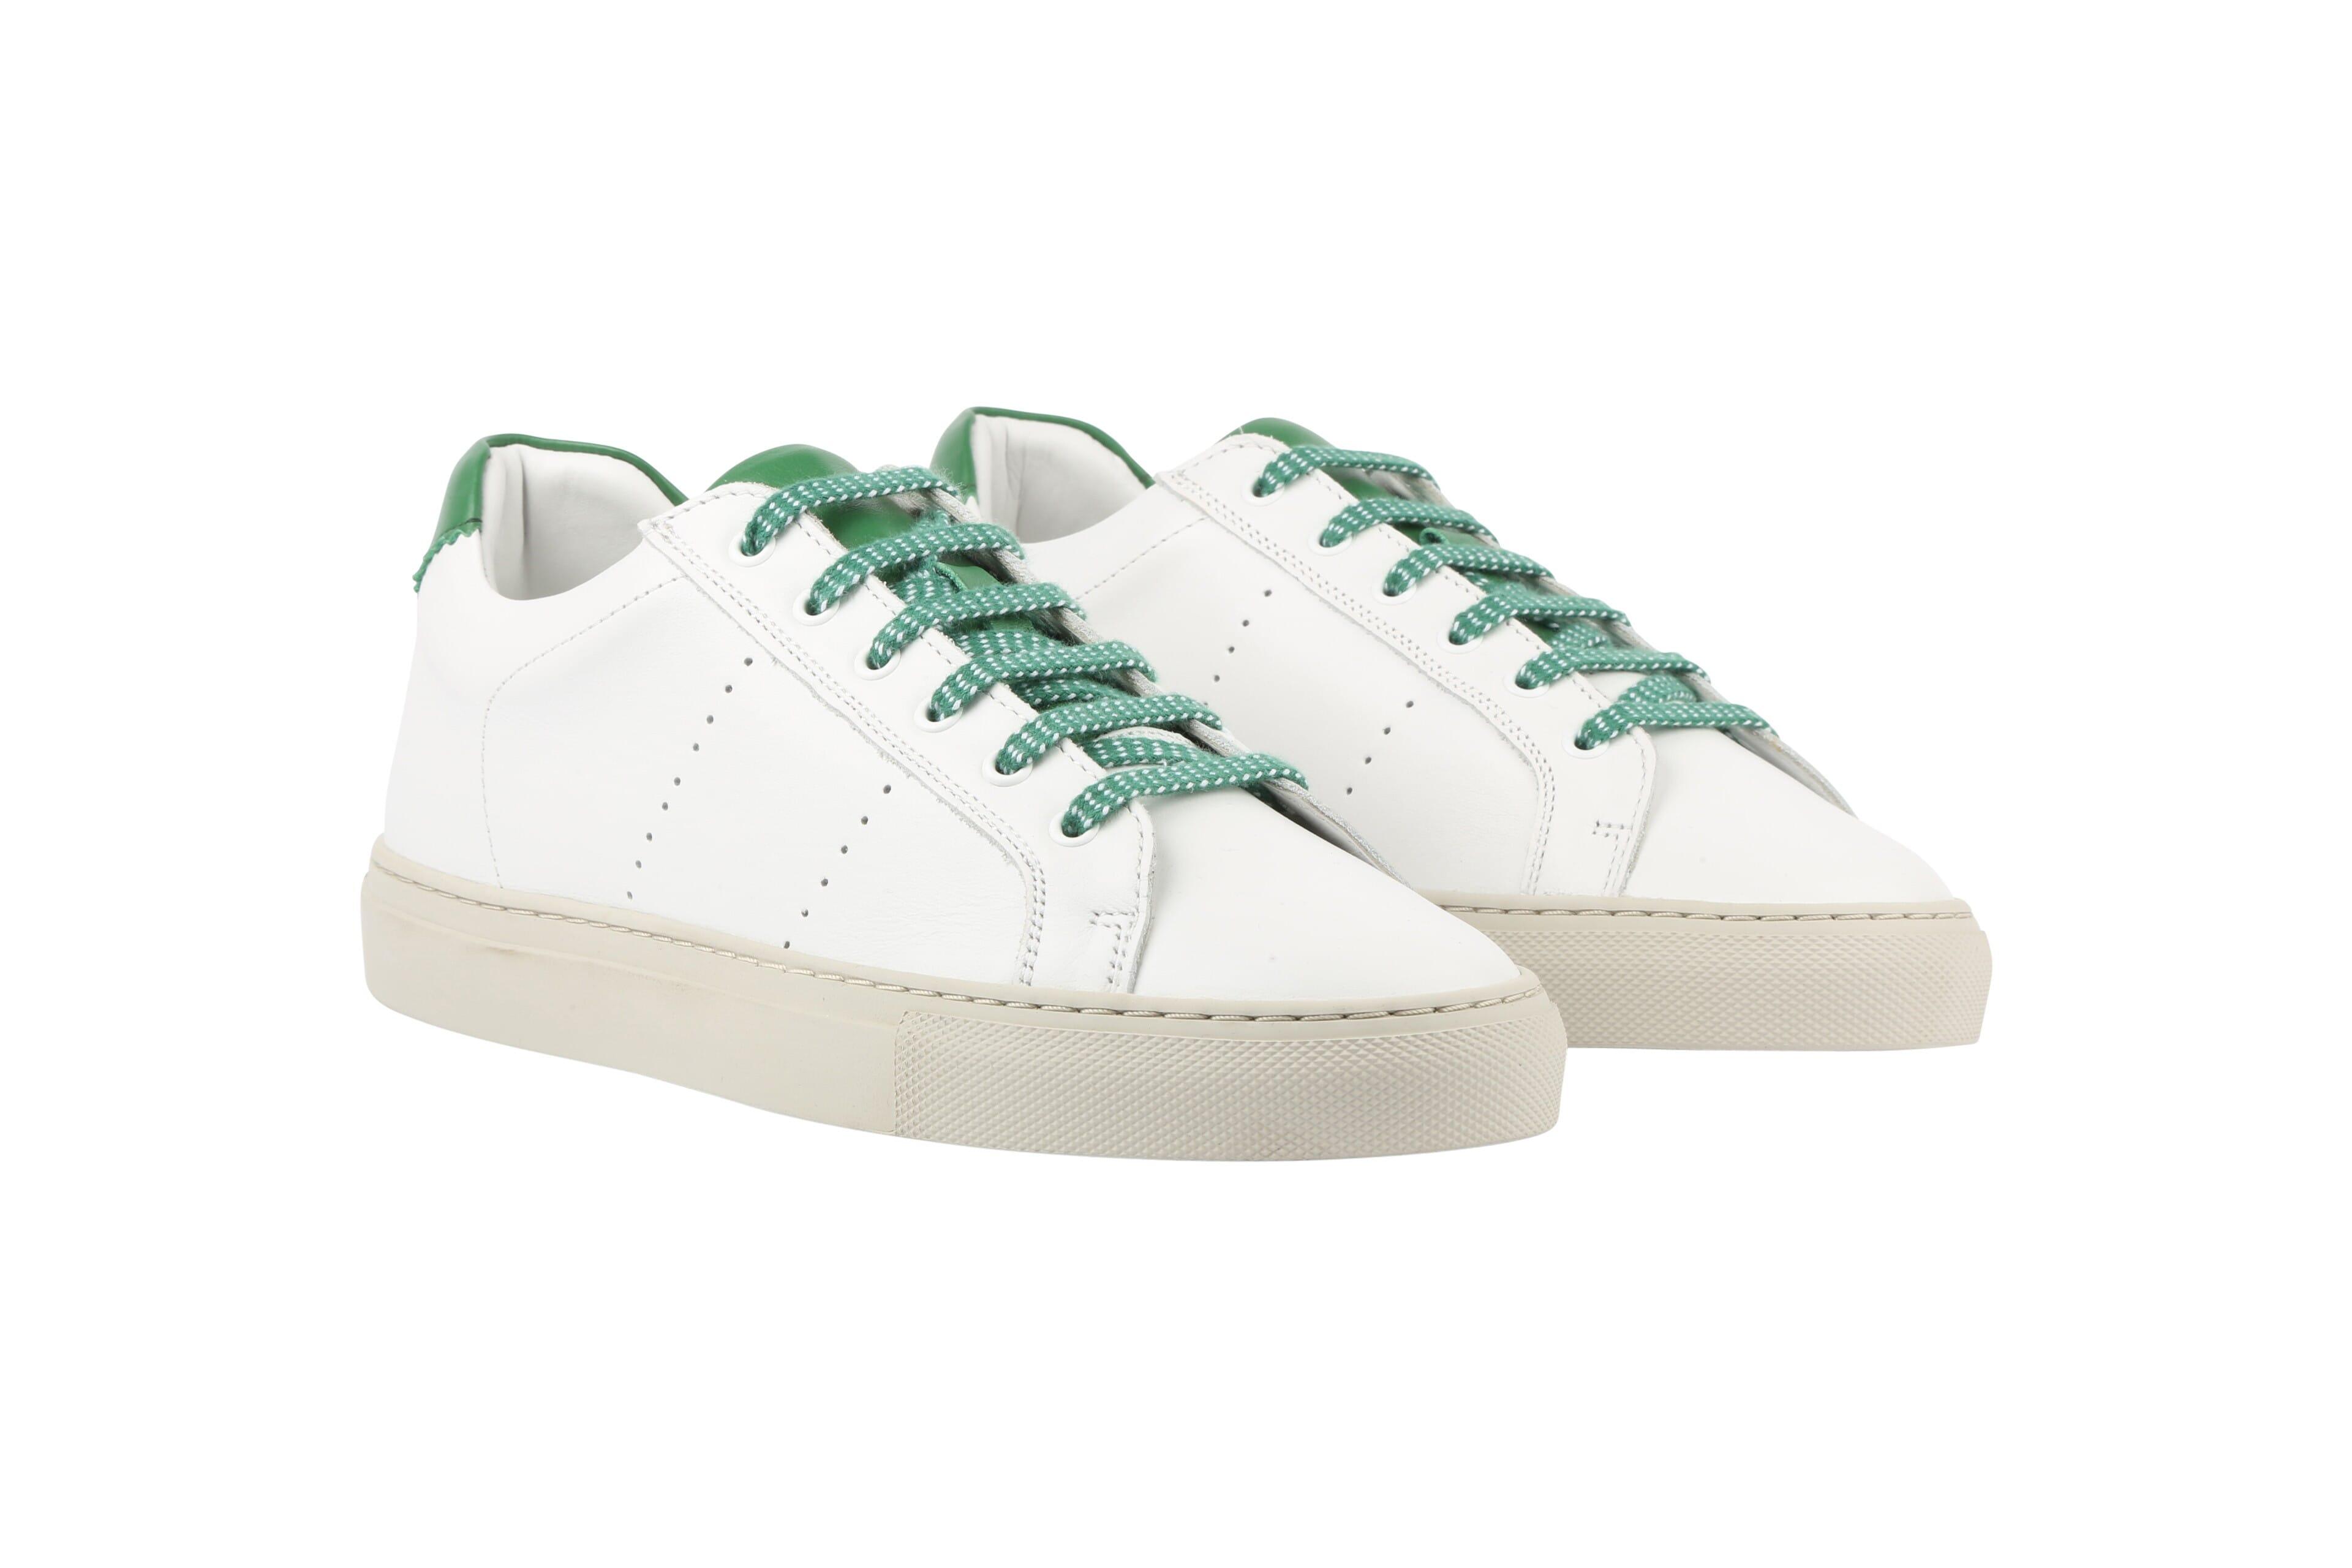 Edition 4 Soft blanche et verte